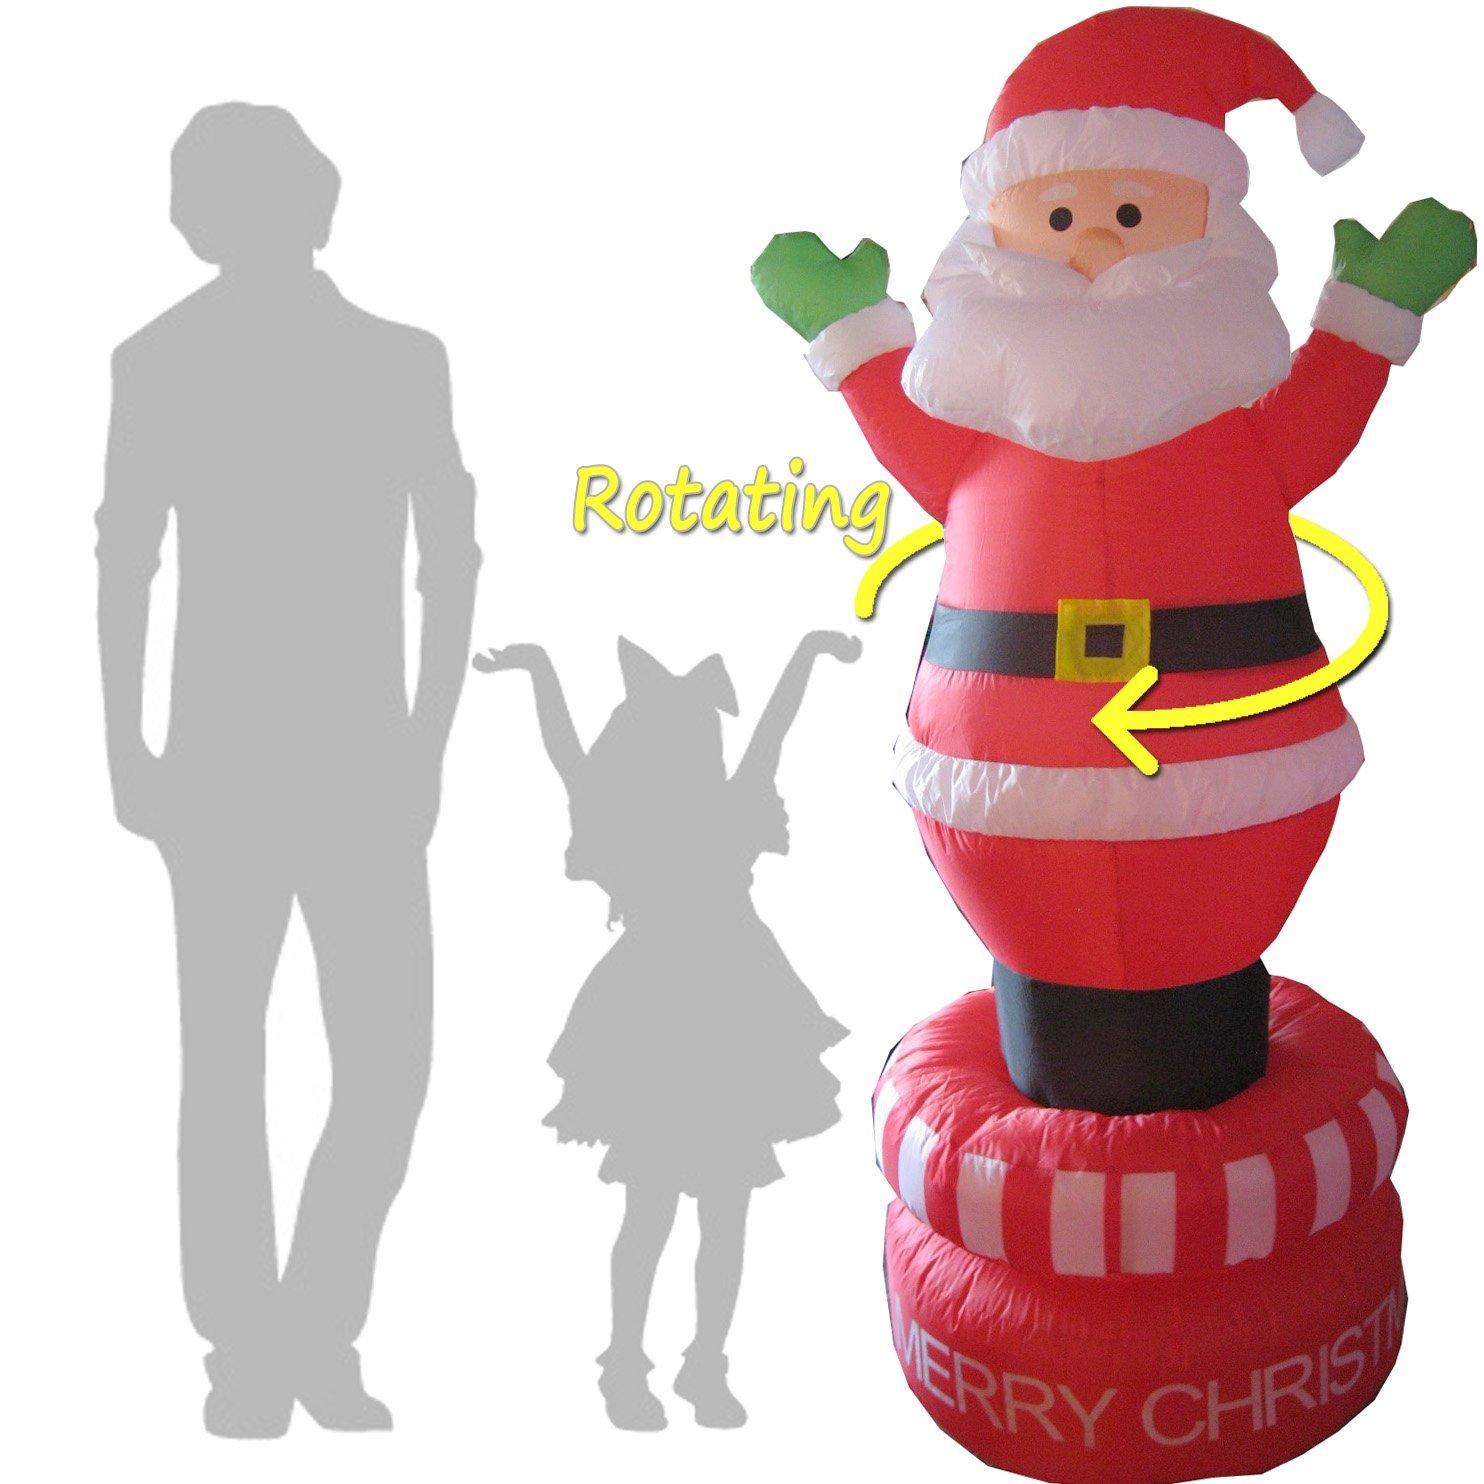 Amazon.com: Electric Rotating 6 foot Christmas Inflatables Santa ...